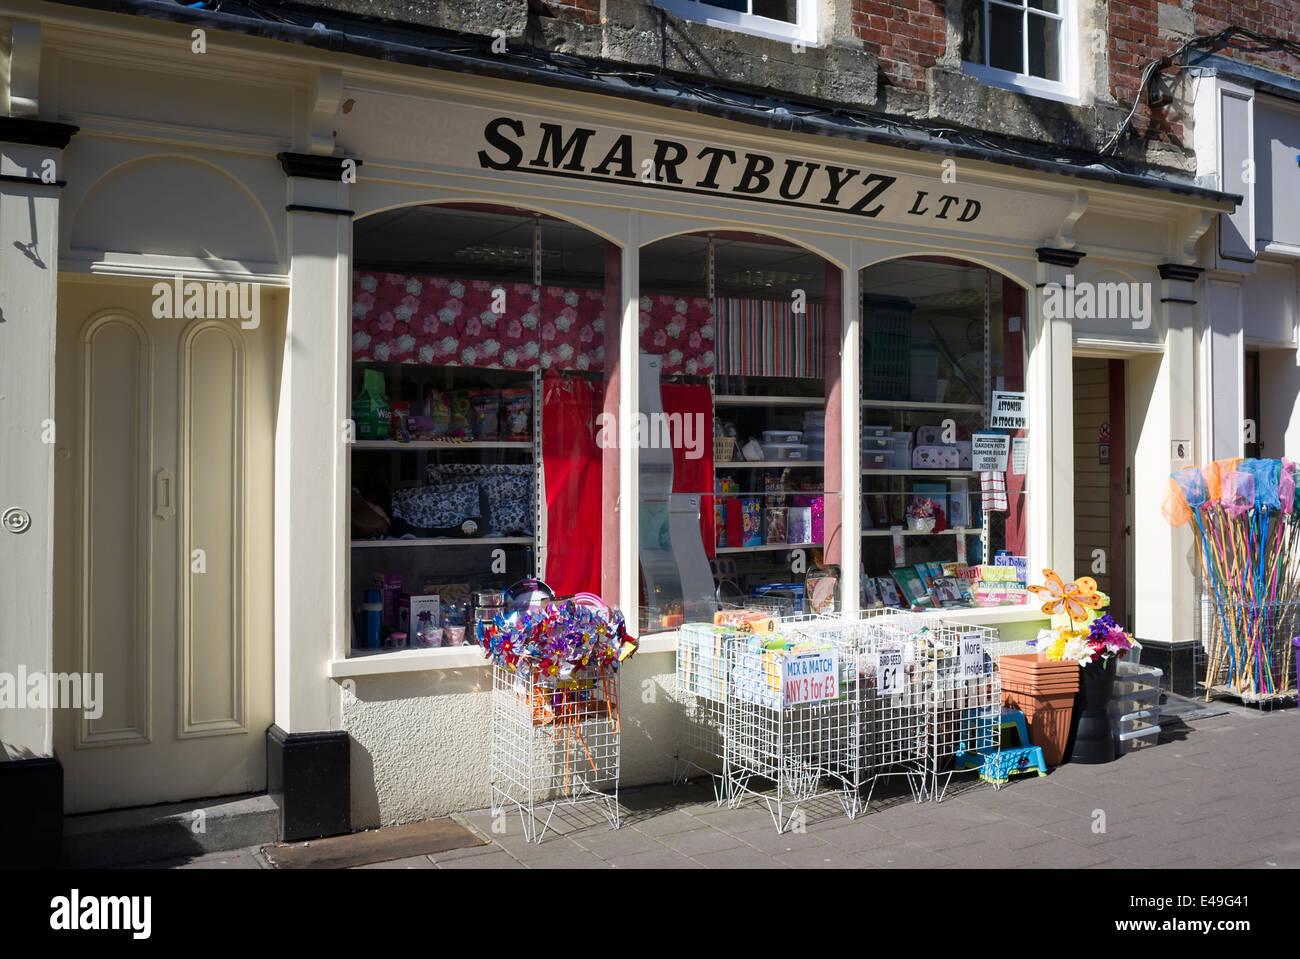 SMARTBUYZ Budget-Shop in Devizes, UK Stockbild